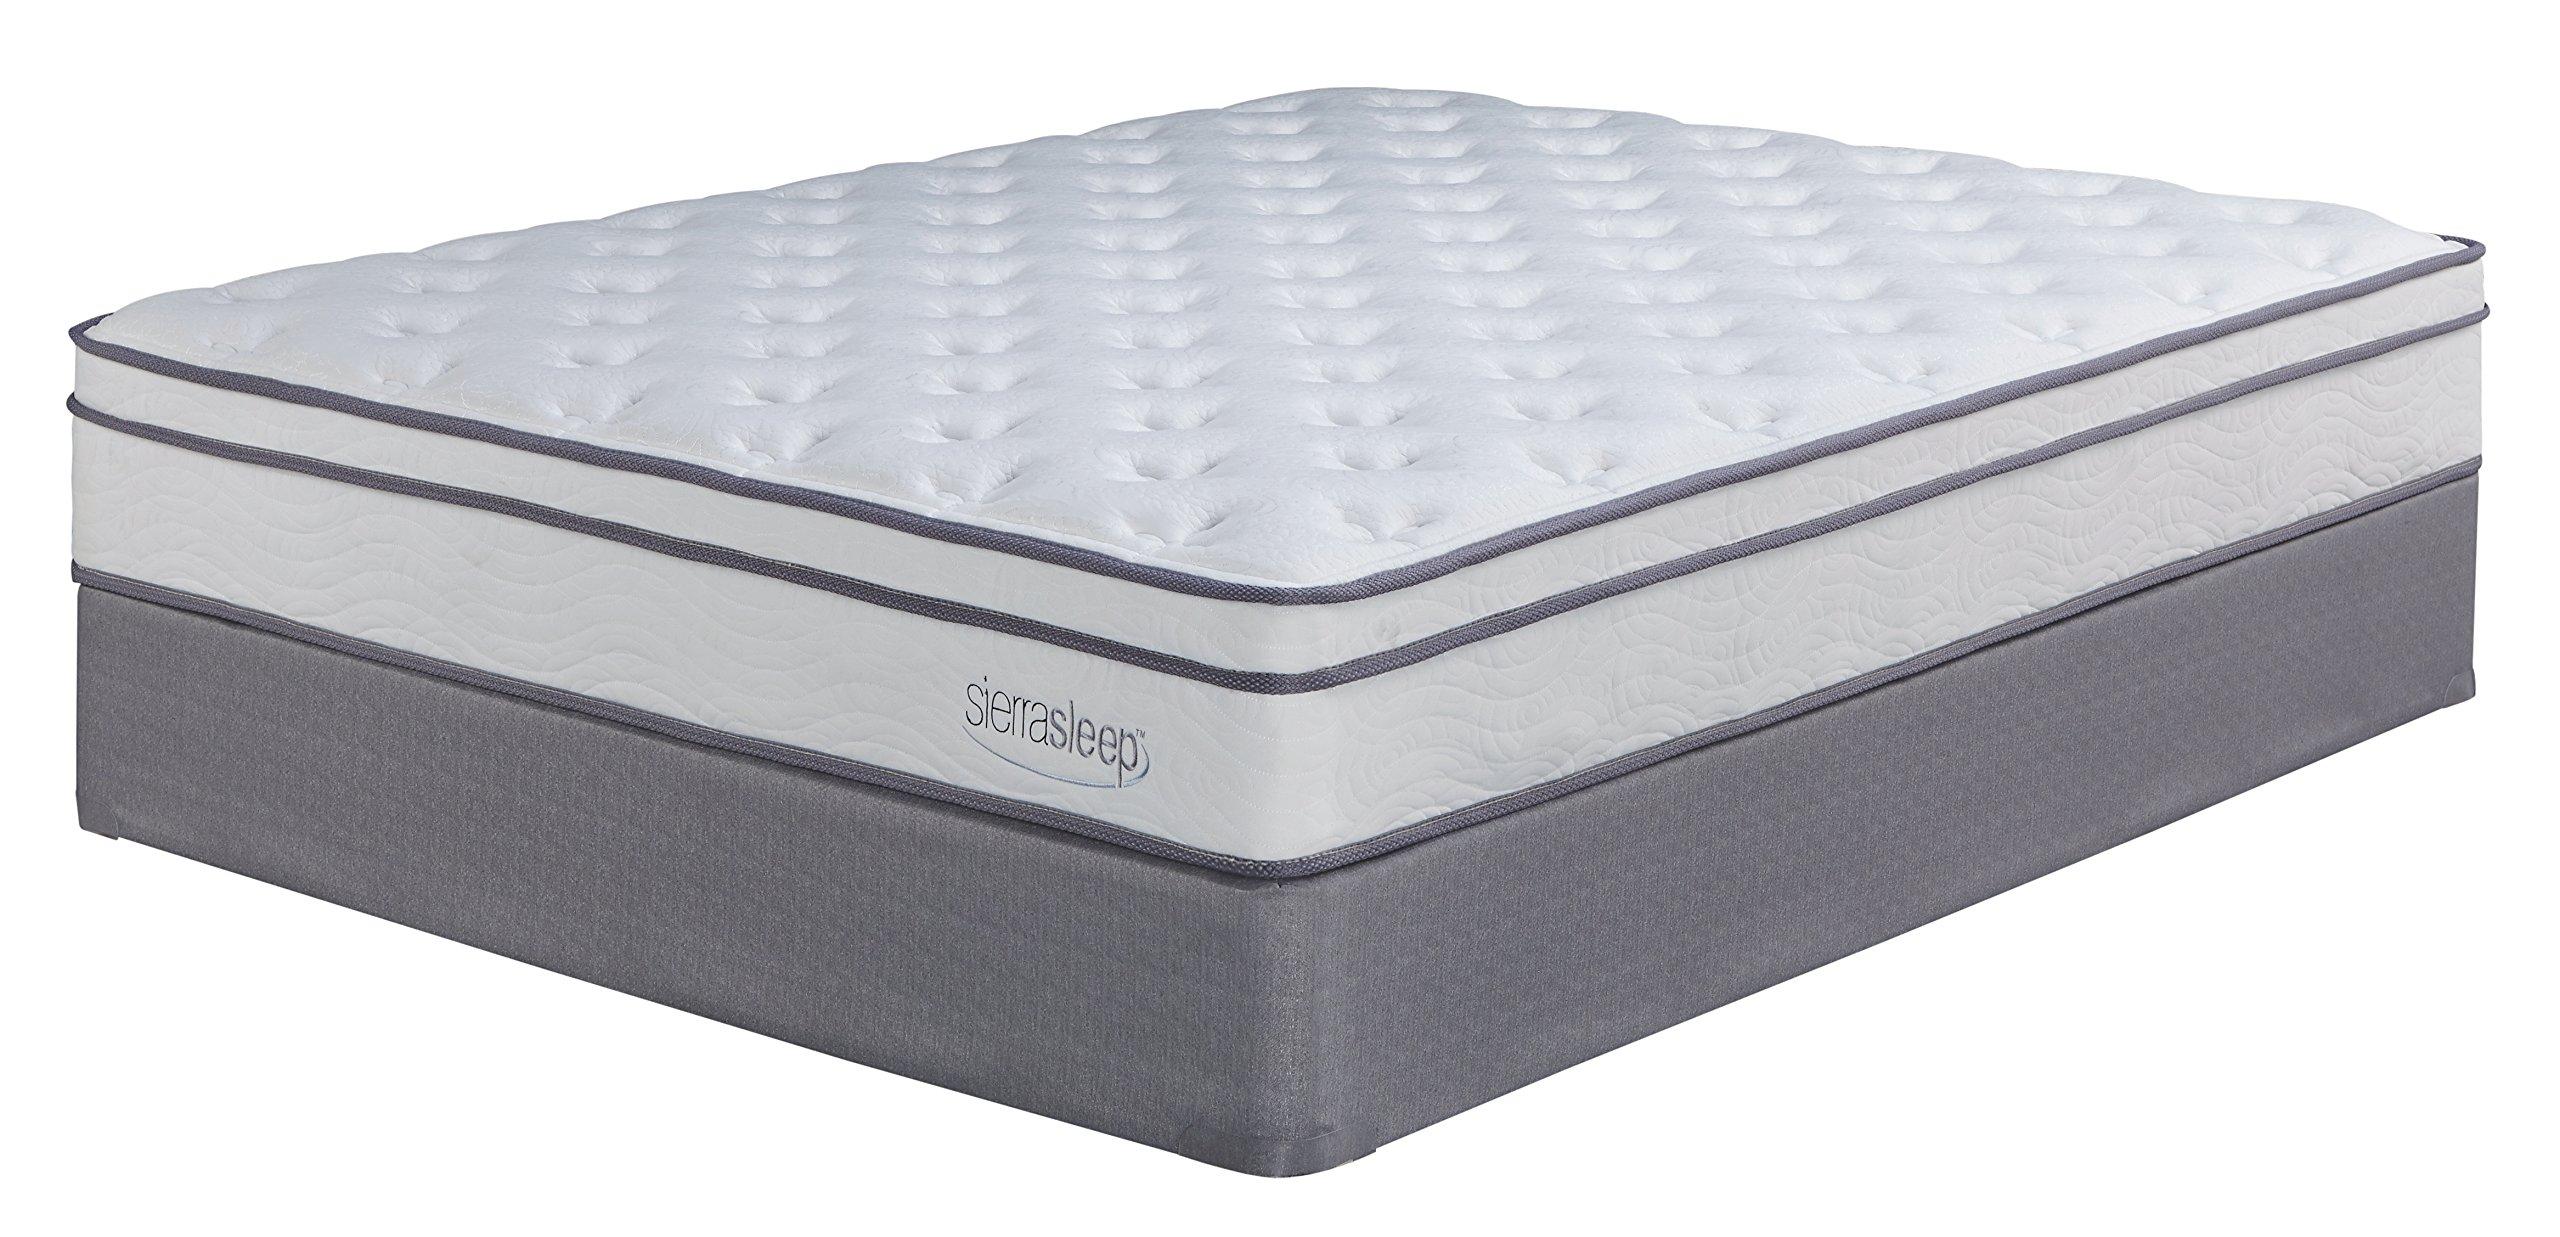 Sierra Sleep by Ashley M90711 Mattress, Twin, White